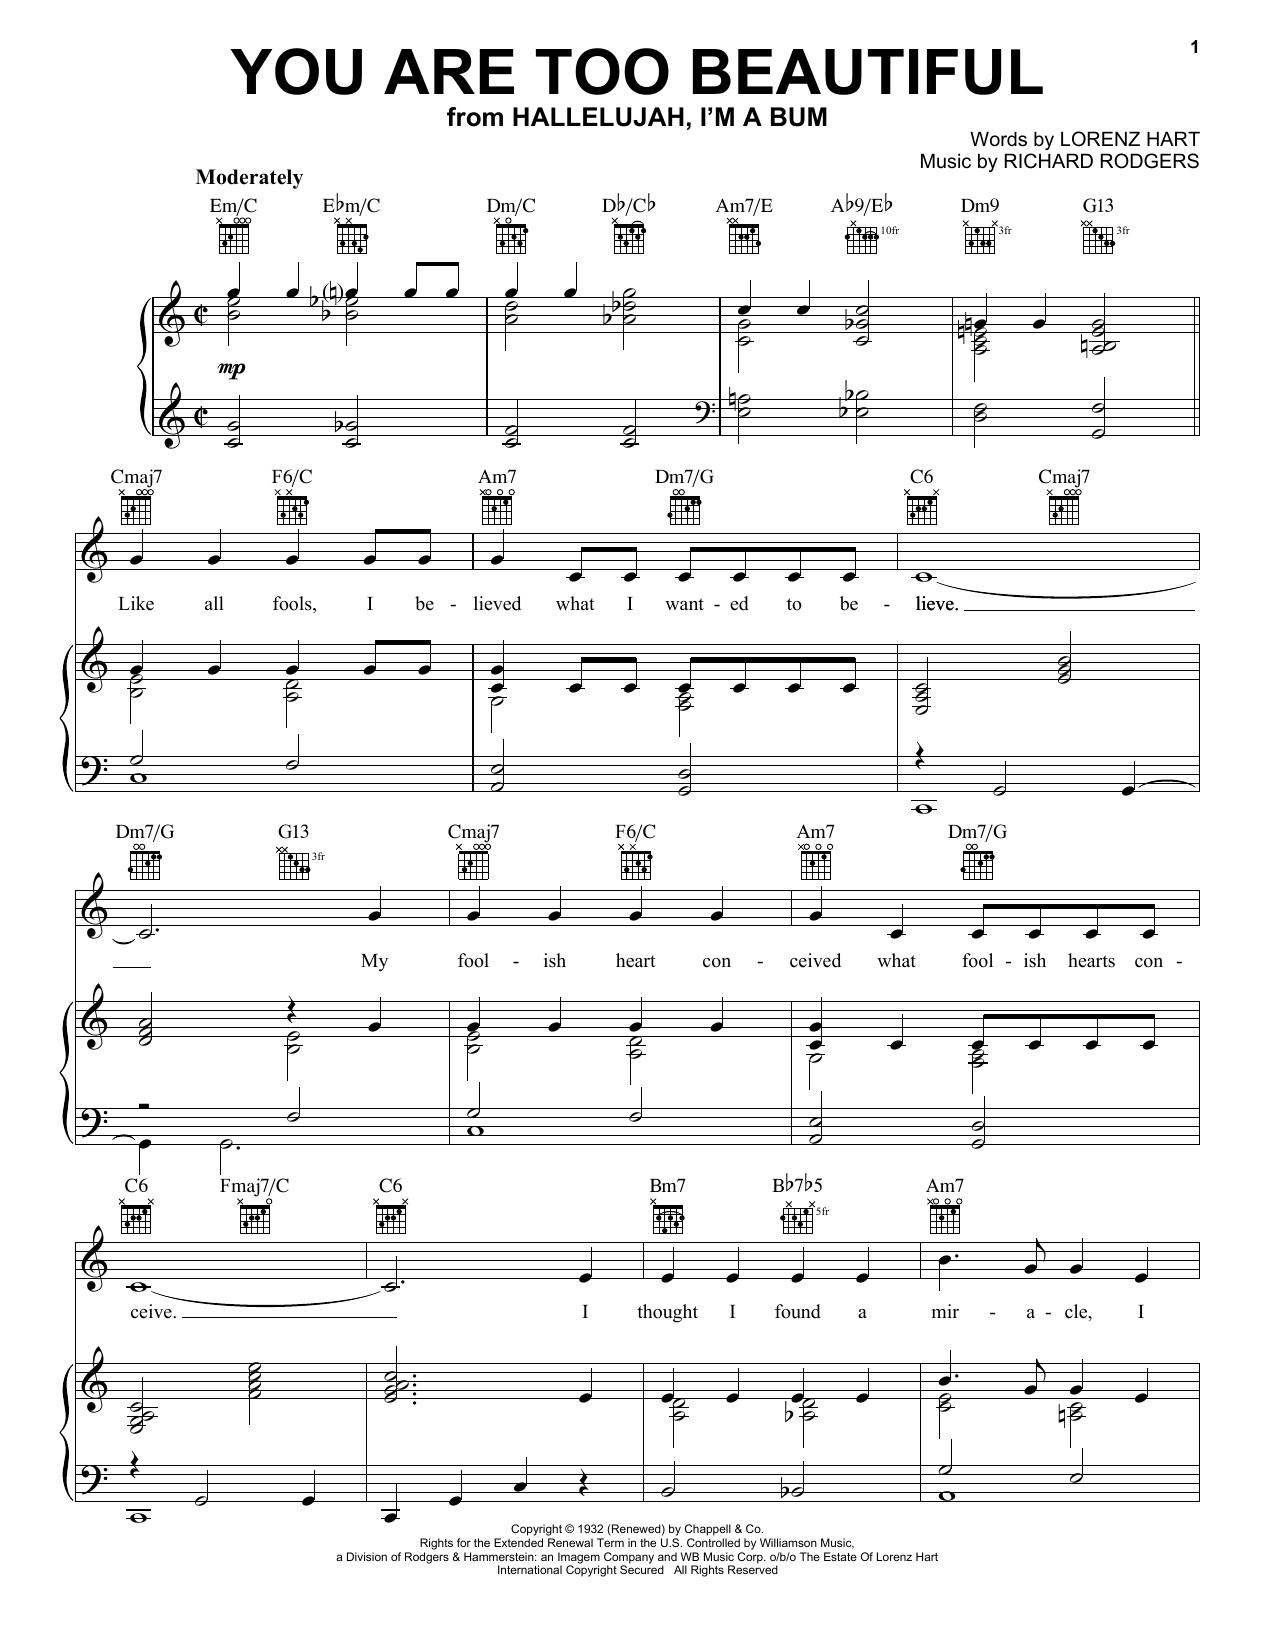 You Are Too Beautiful sheet music